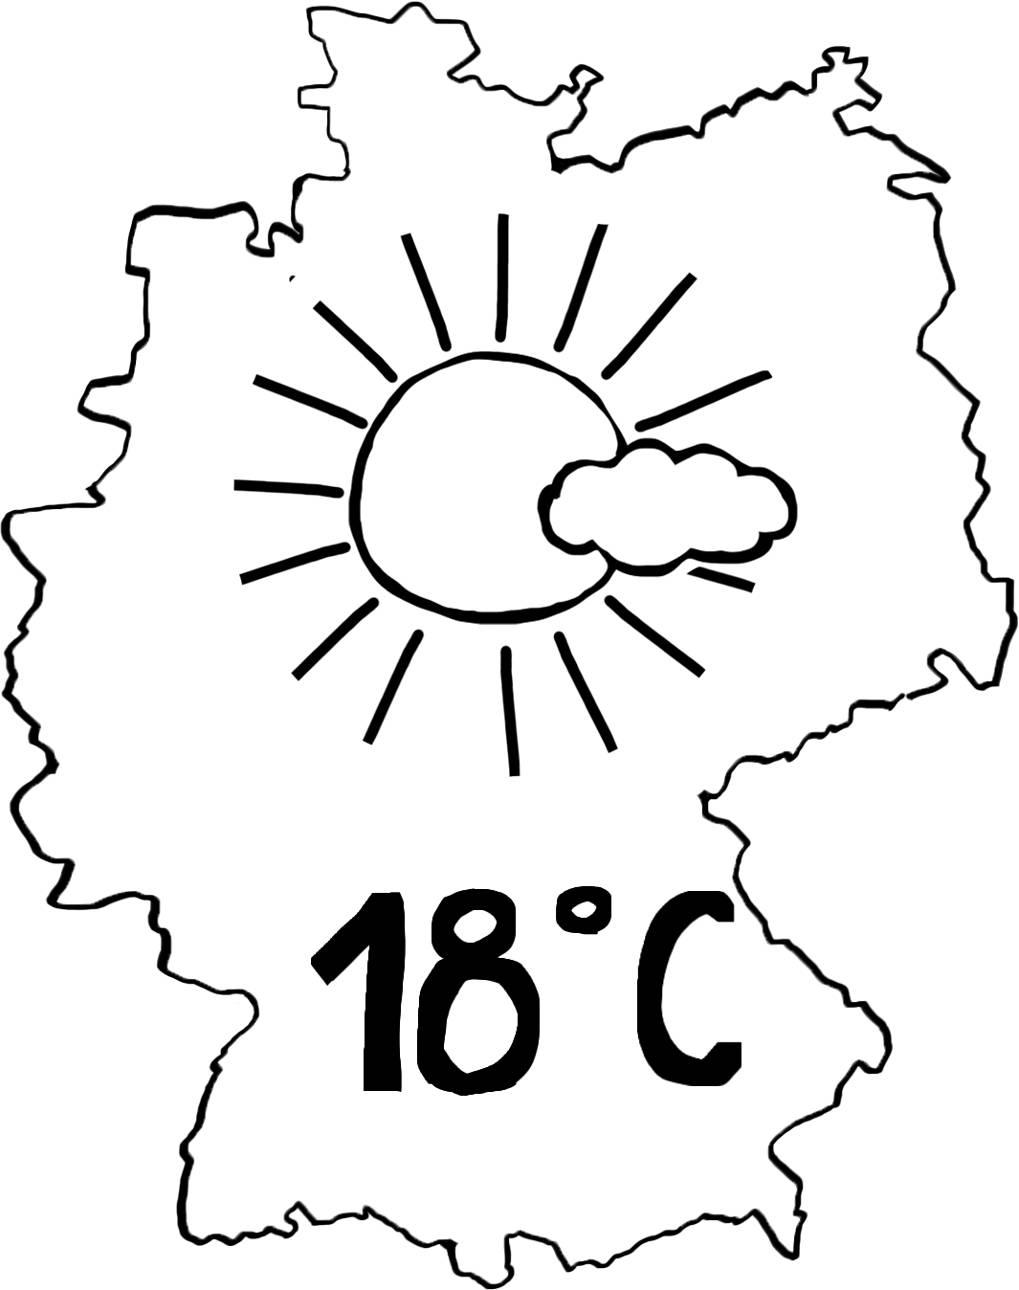 Wetterbericht.jpg